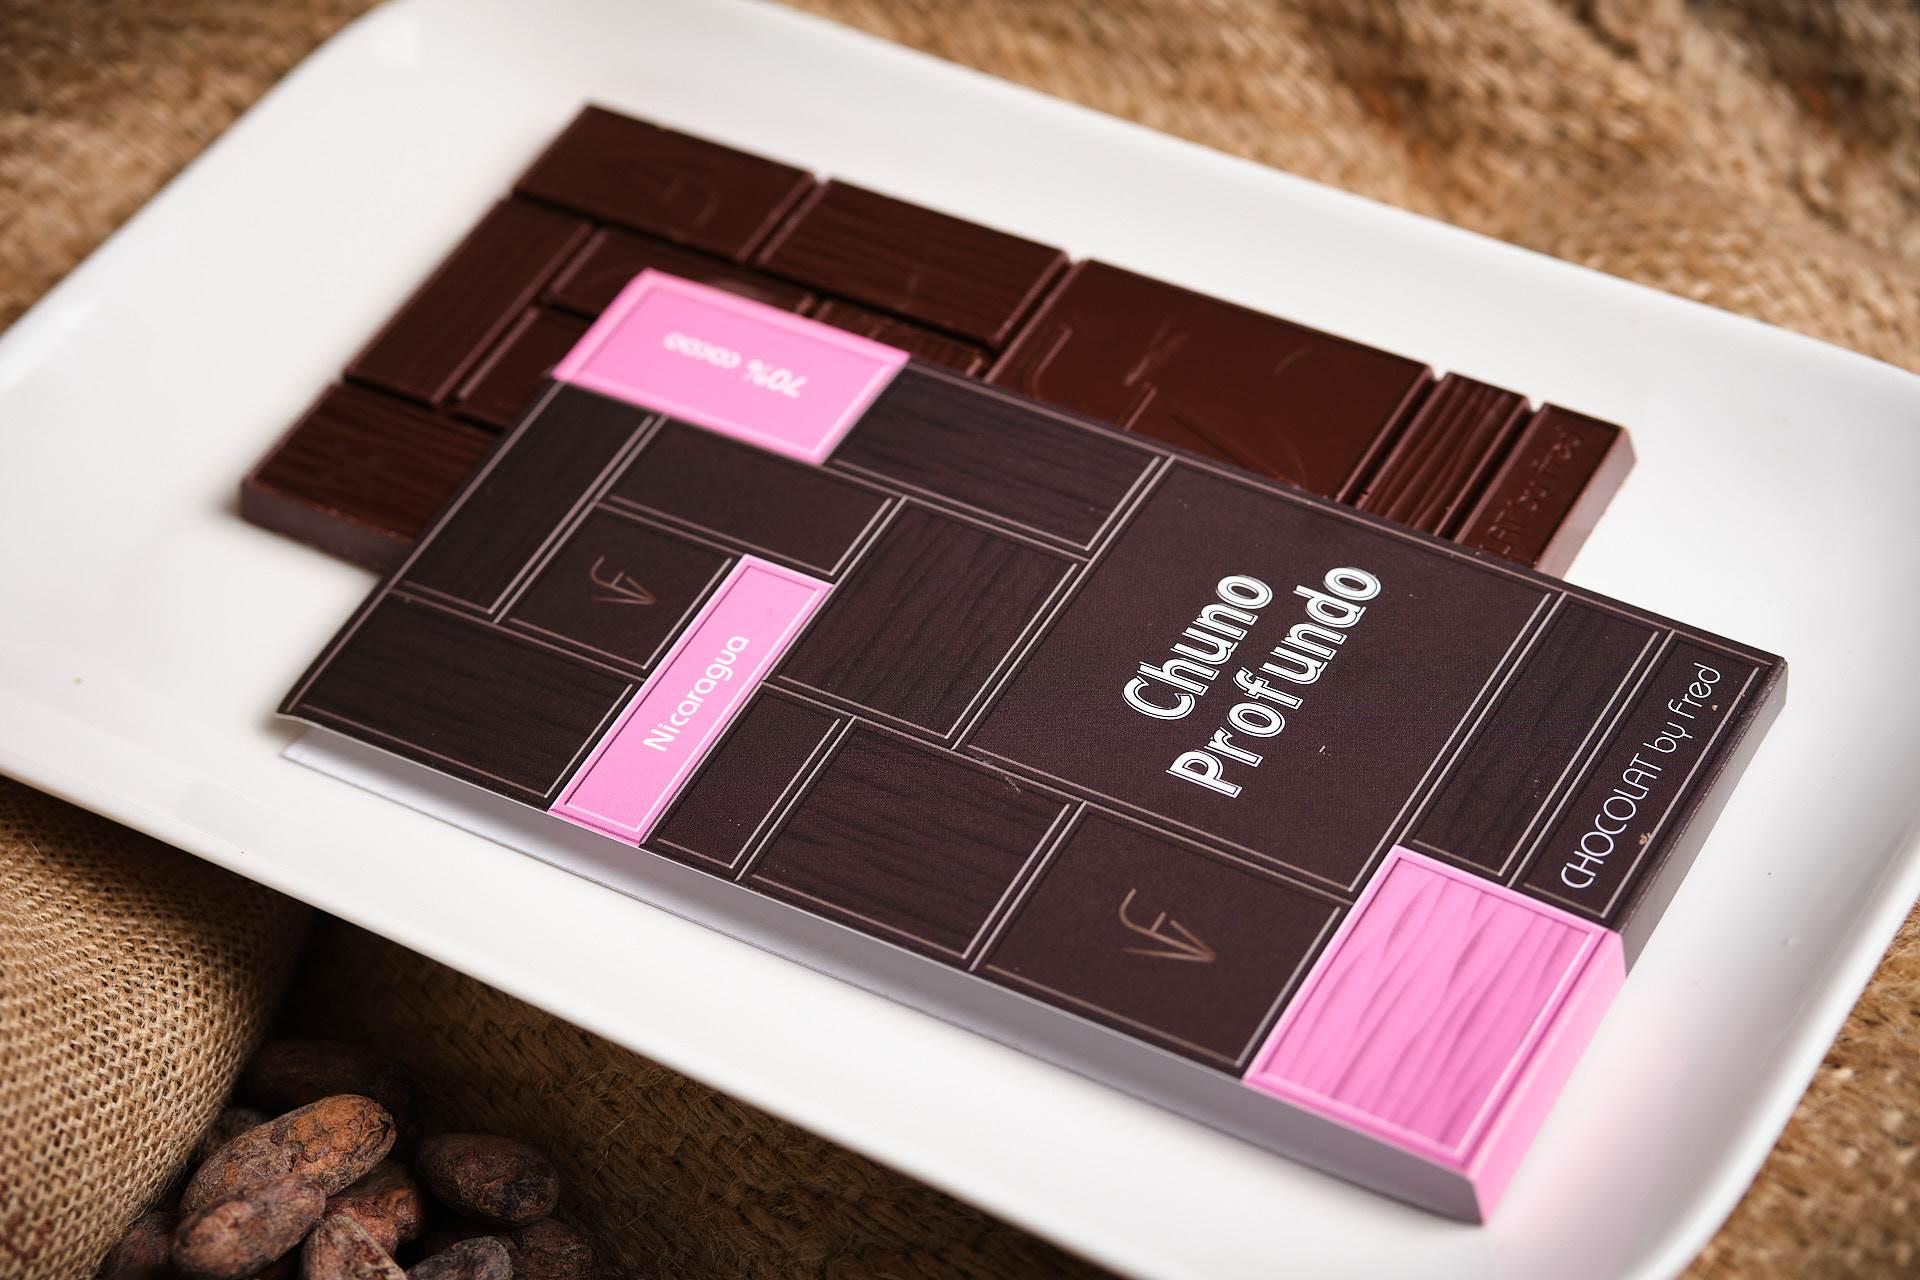 Chocolatier à Épinal